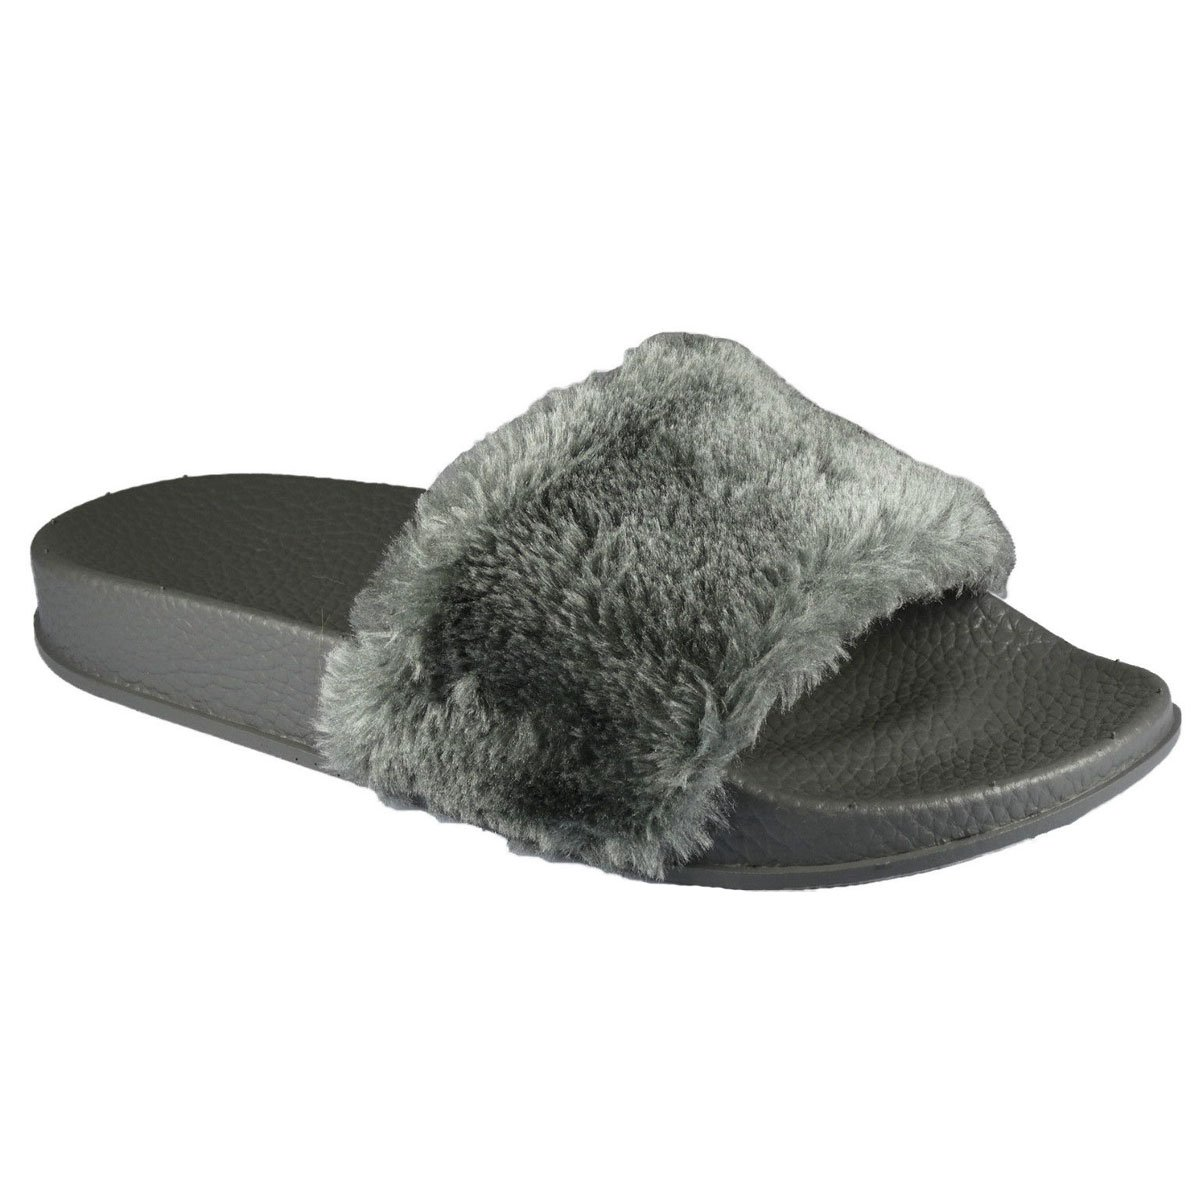 scarpedays Peep Toe Toe Toe grigio donna grigio Peep Toe be167f   fb92cb